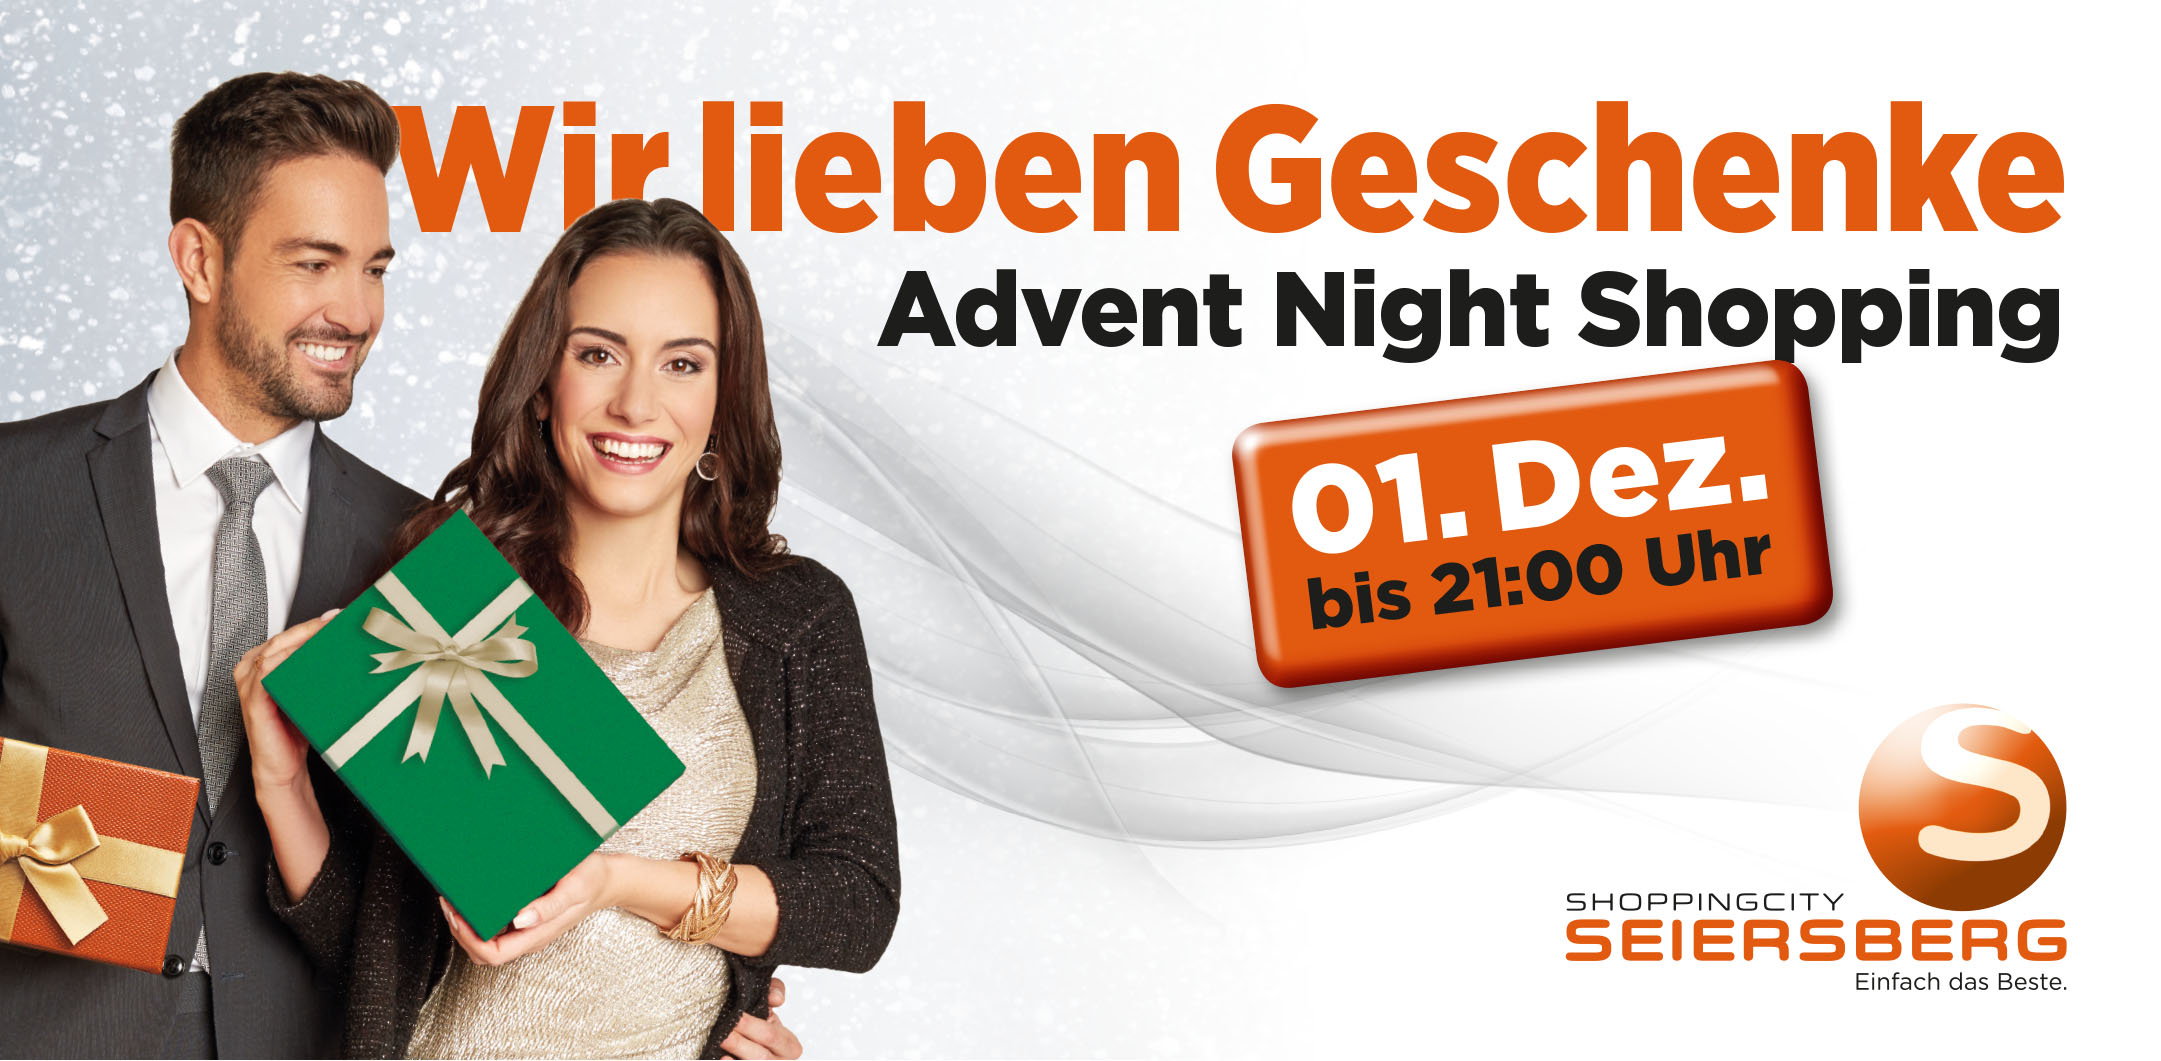 SC-Seiersberg-Image-Wir-lieben-Geschenke